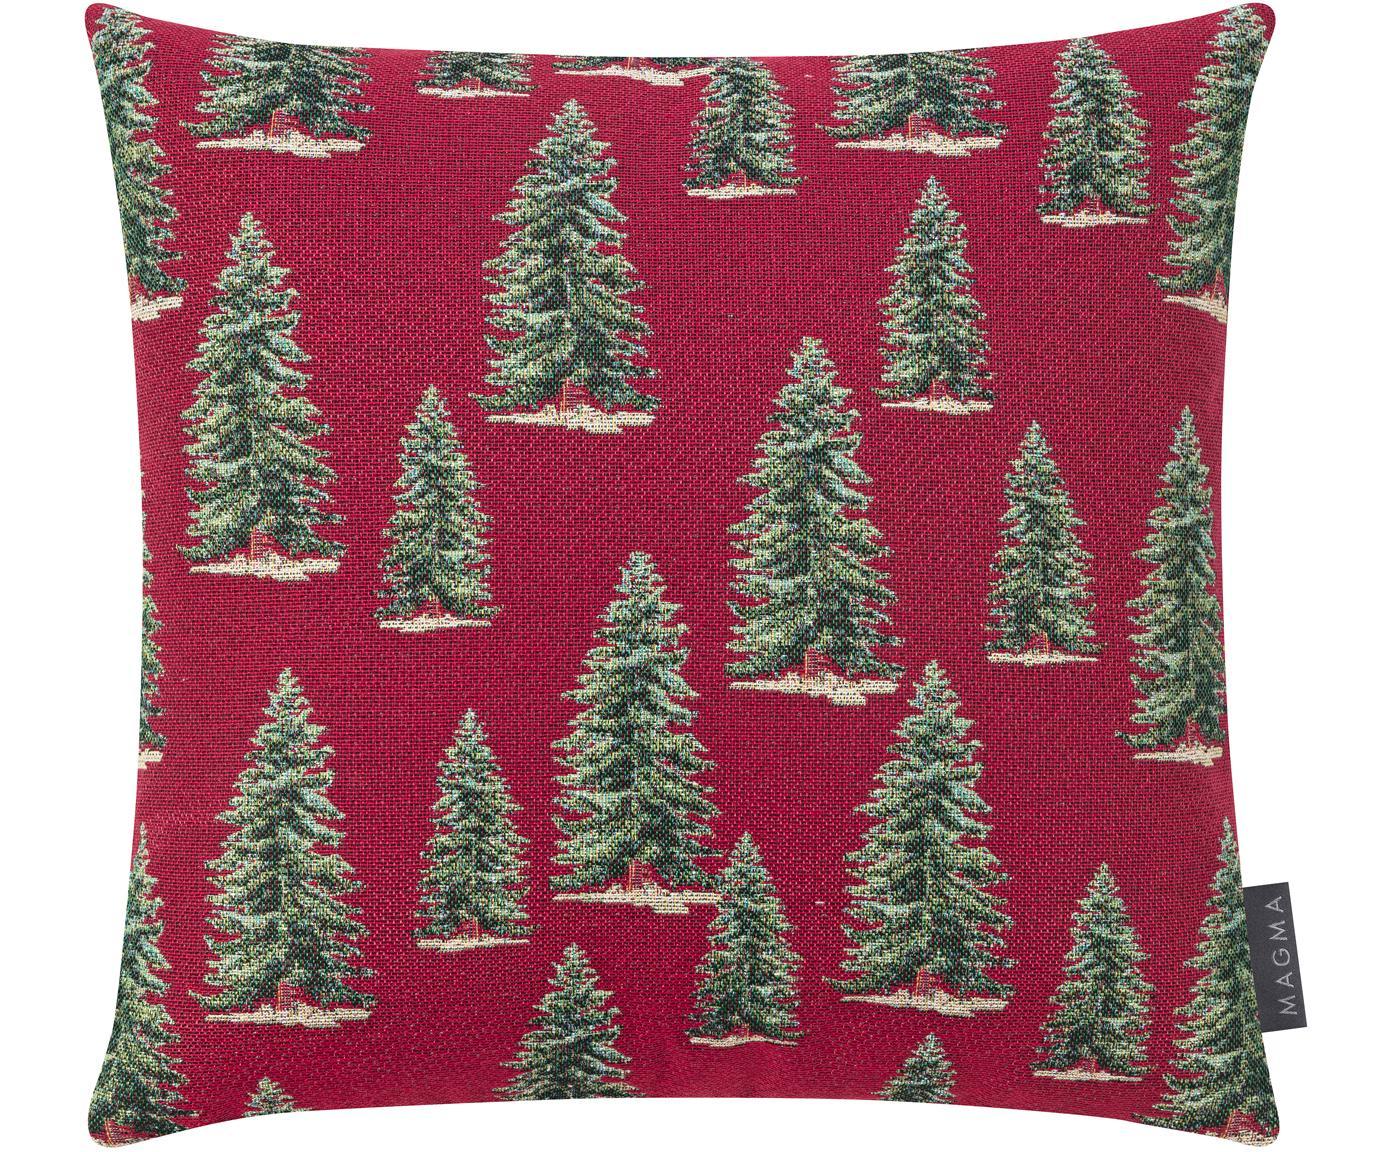 Kussenhoes Pinetree in rood/groen, Weeftechniek: jacquard, Rood, groen, beige, 40 x 40 cm